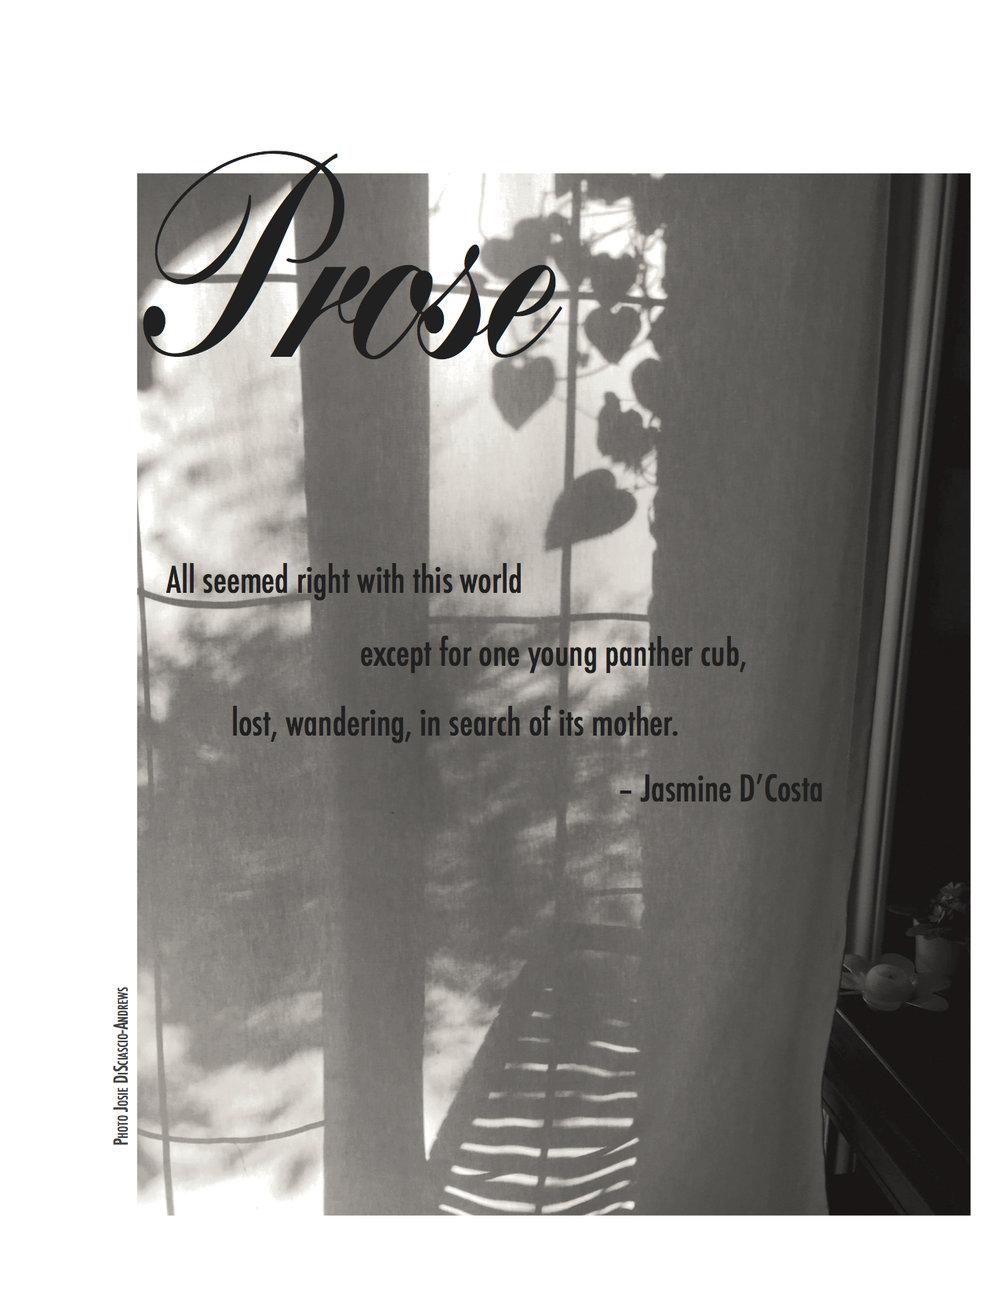 Artis 2 page 17 Prose cover.jpg